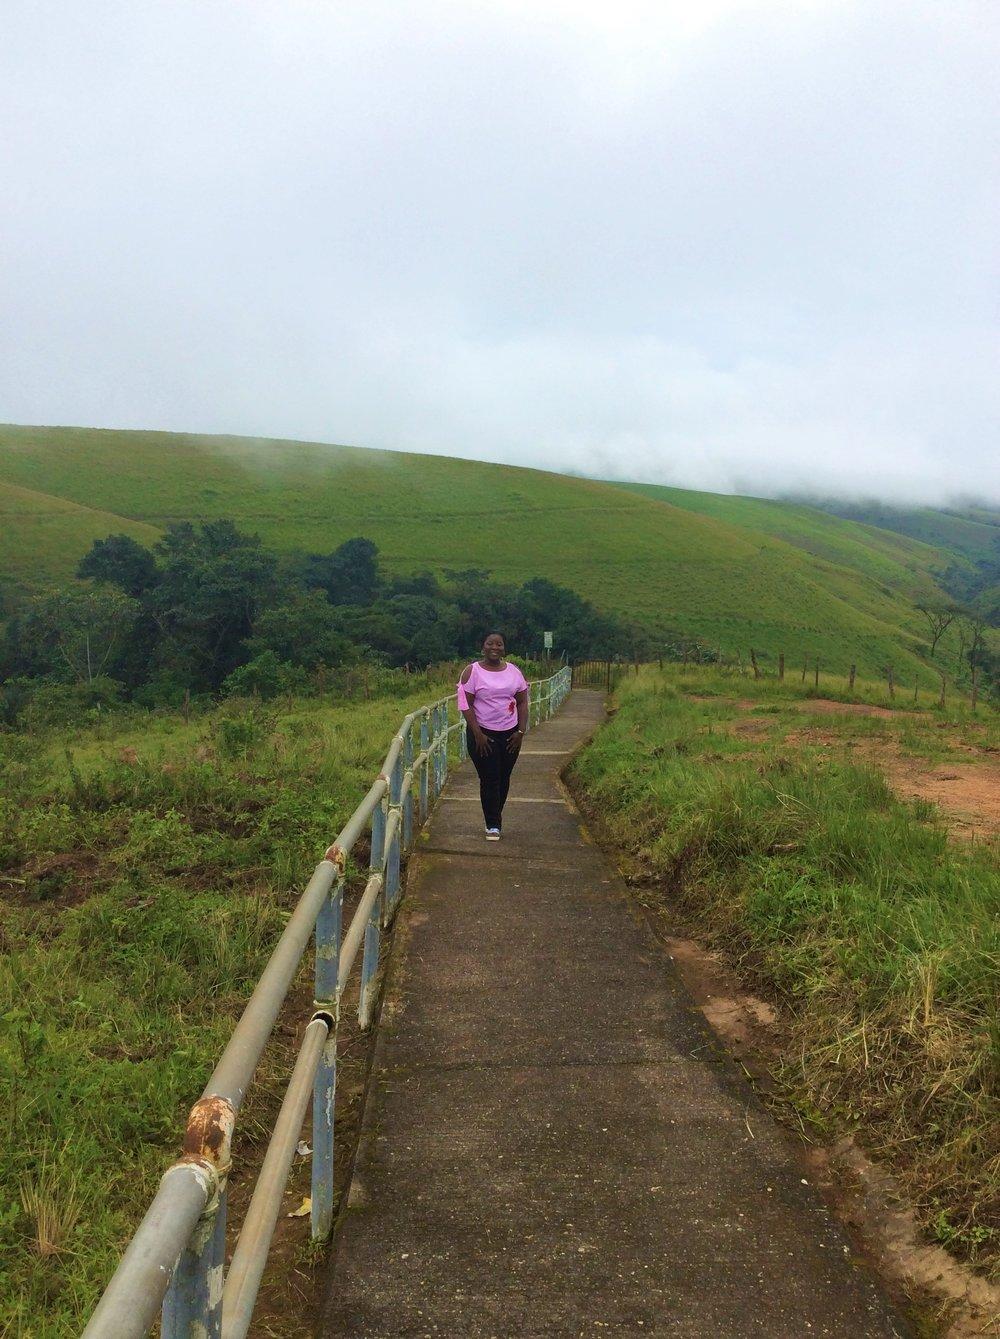 OBUDU MOUNTAIN RESORT | The Ajala Bug | WALKWAY LEADING TO IGAGA WATERFALL